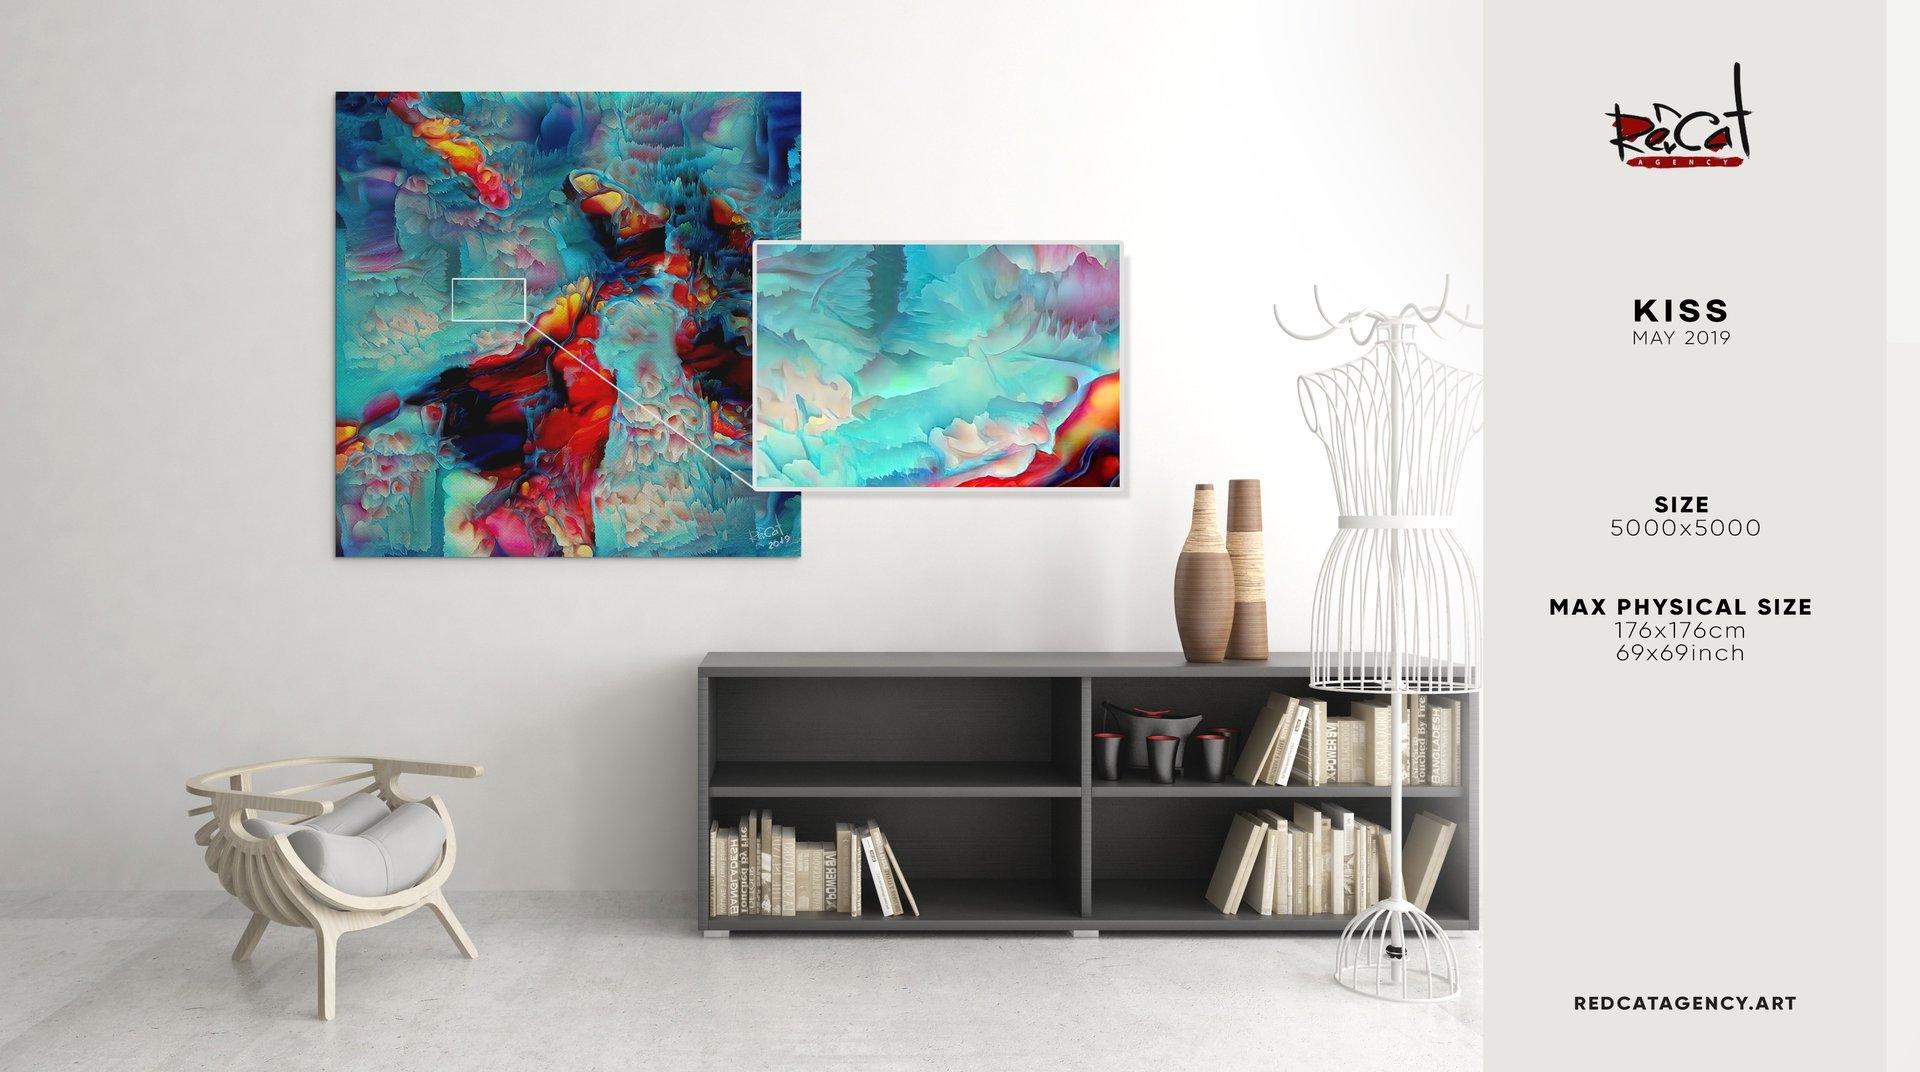 nft art, nft art collection, nft art market, nft art marketplace, nft crypto